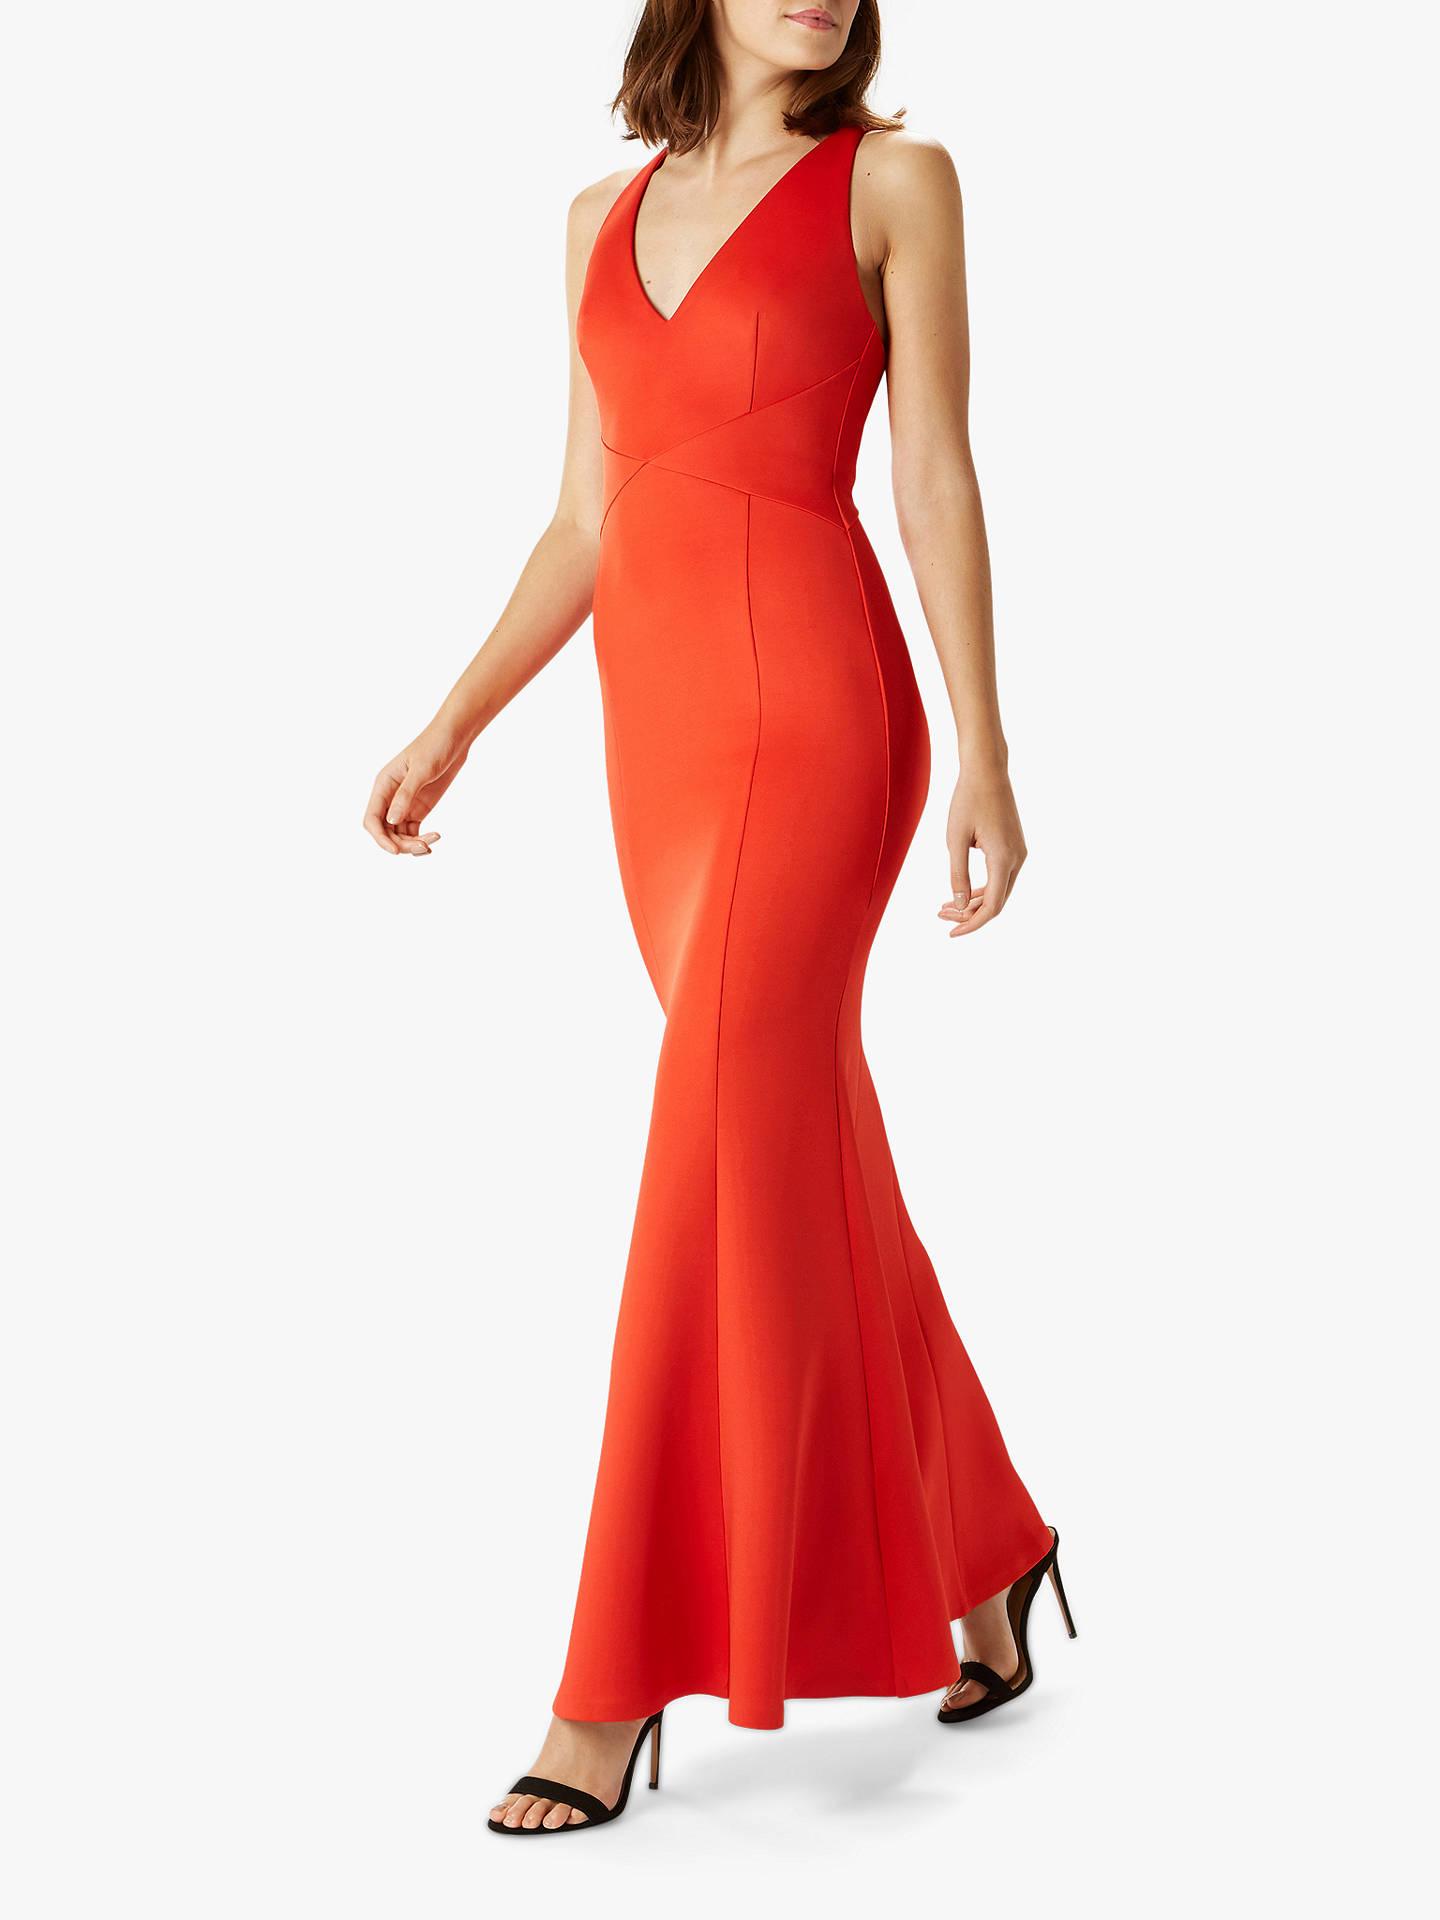 c8b4ec5f7105 Buy Coast Aggie Scuba Tailored Maxi Dress, Red, 16 Online at johnlewis.com  ...